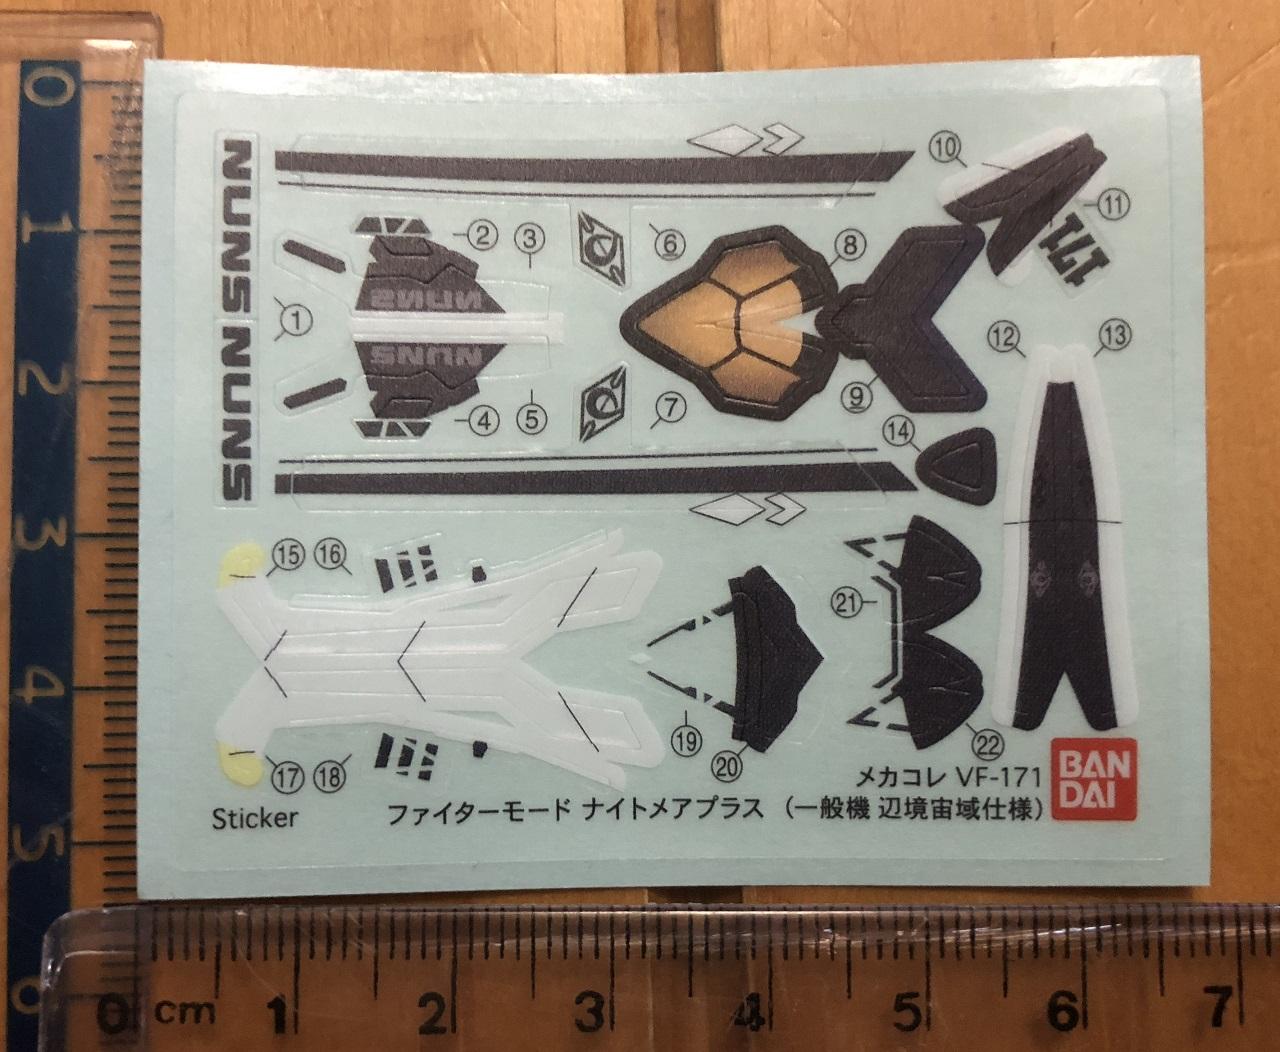 stickers_01.jpg.dc35675b47ed23a34ef2e03b86590357.jpg